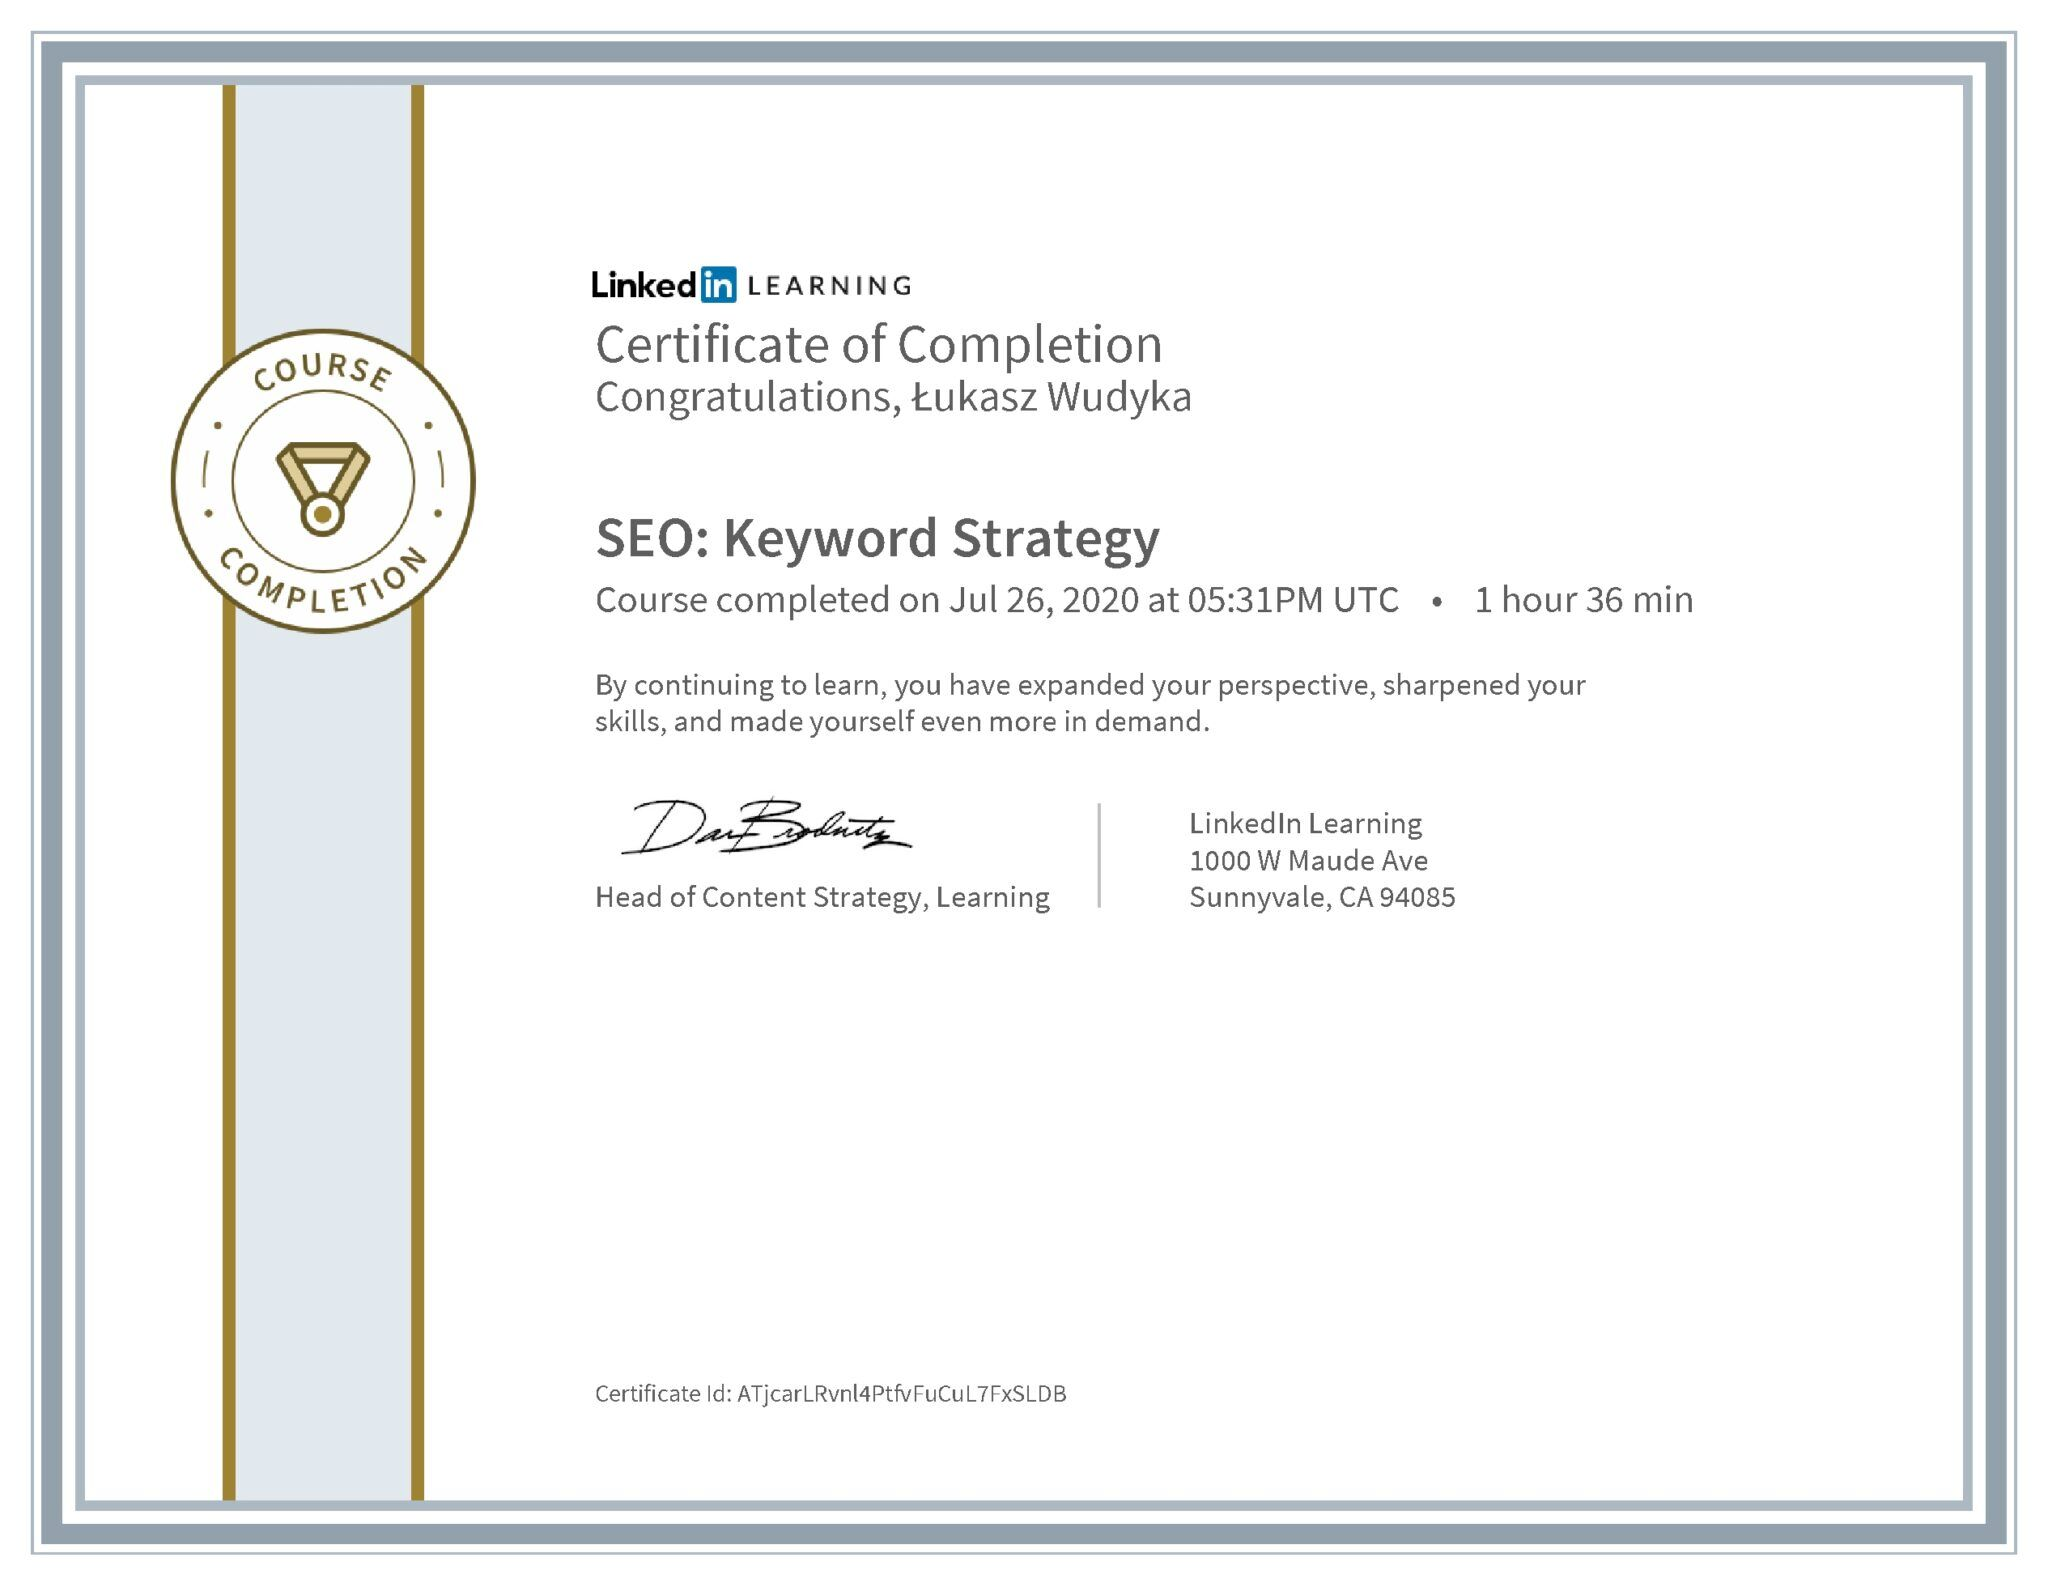 Łukasz Wudyka certyfikat LinkedIn SEO: Keyword Strategy